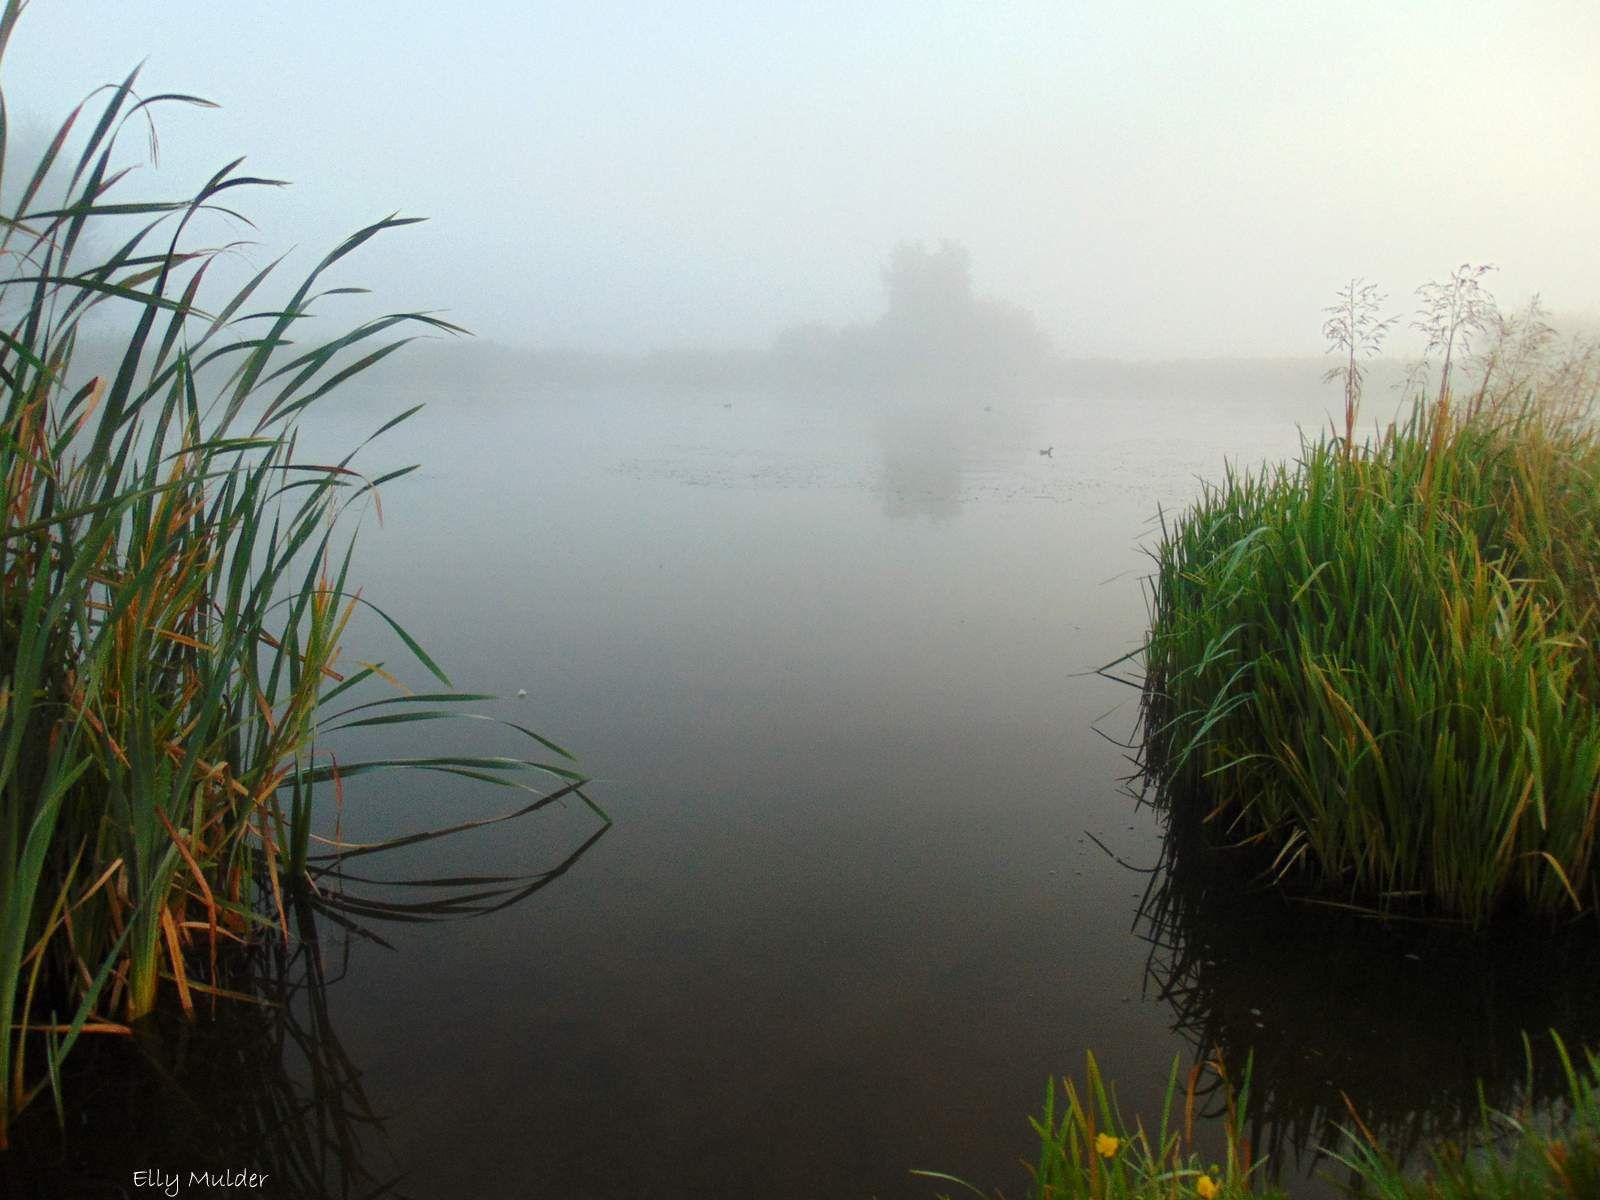 #mist #fogg #landschap #landscape #water